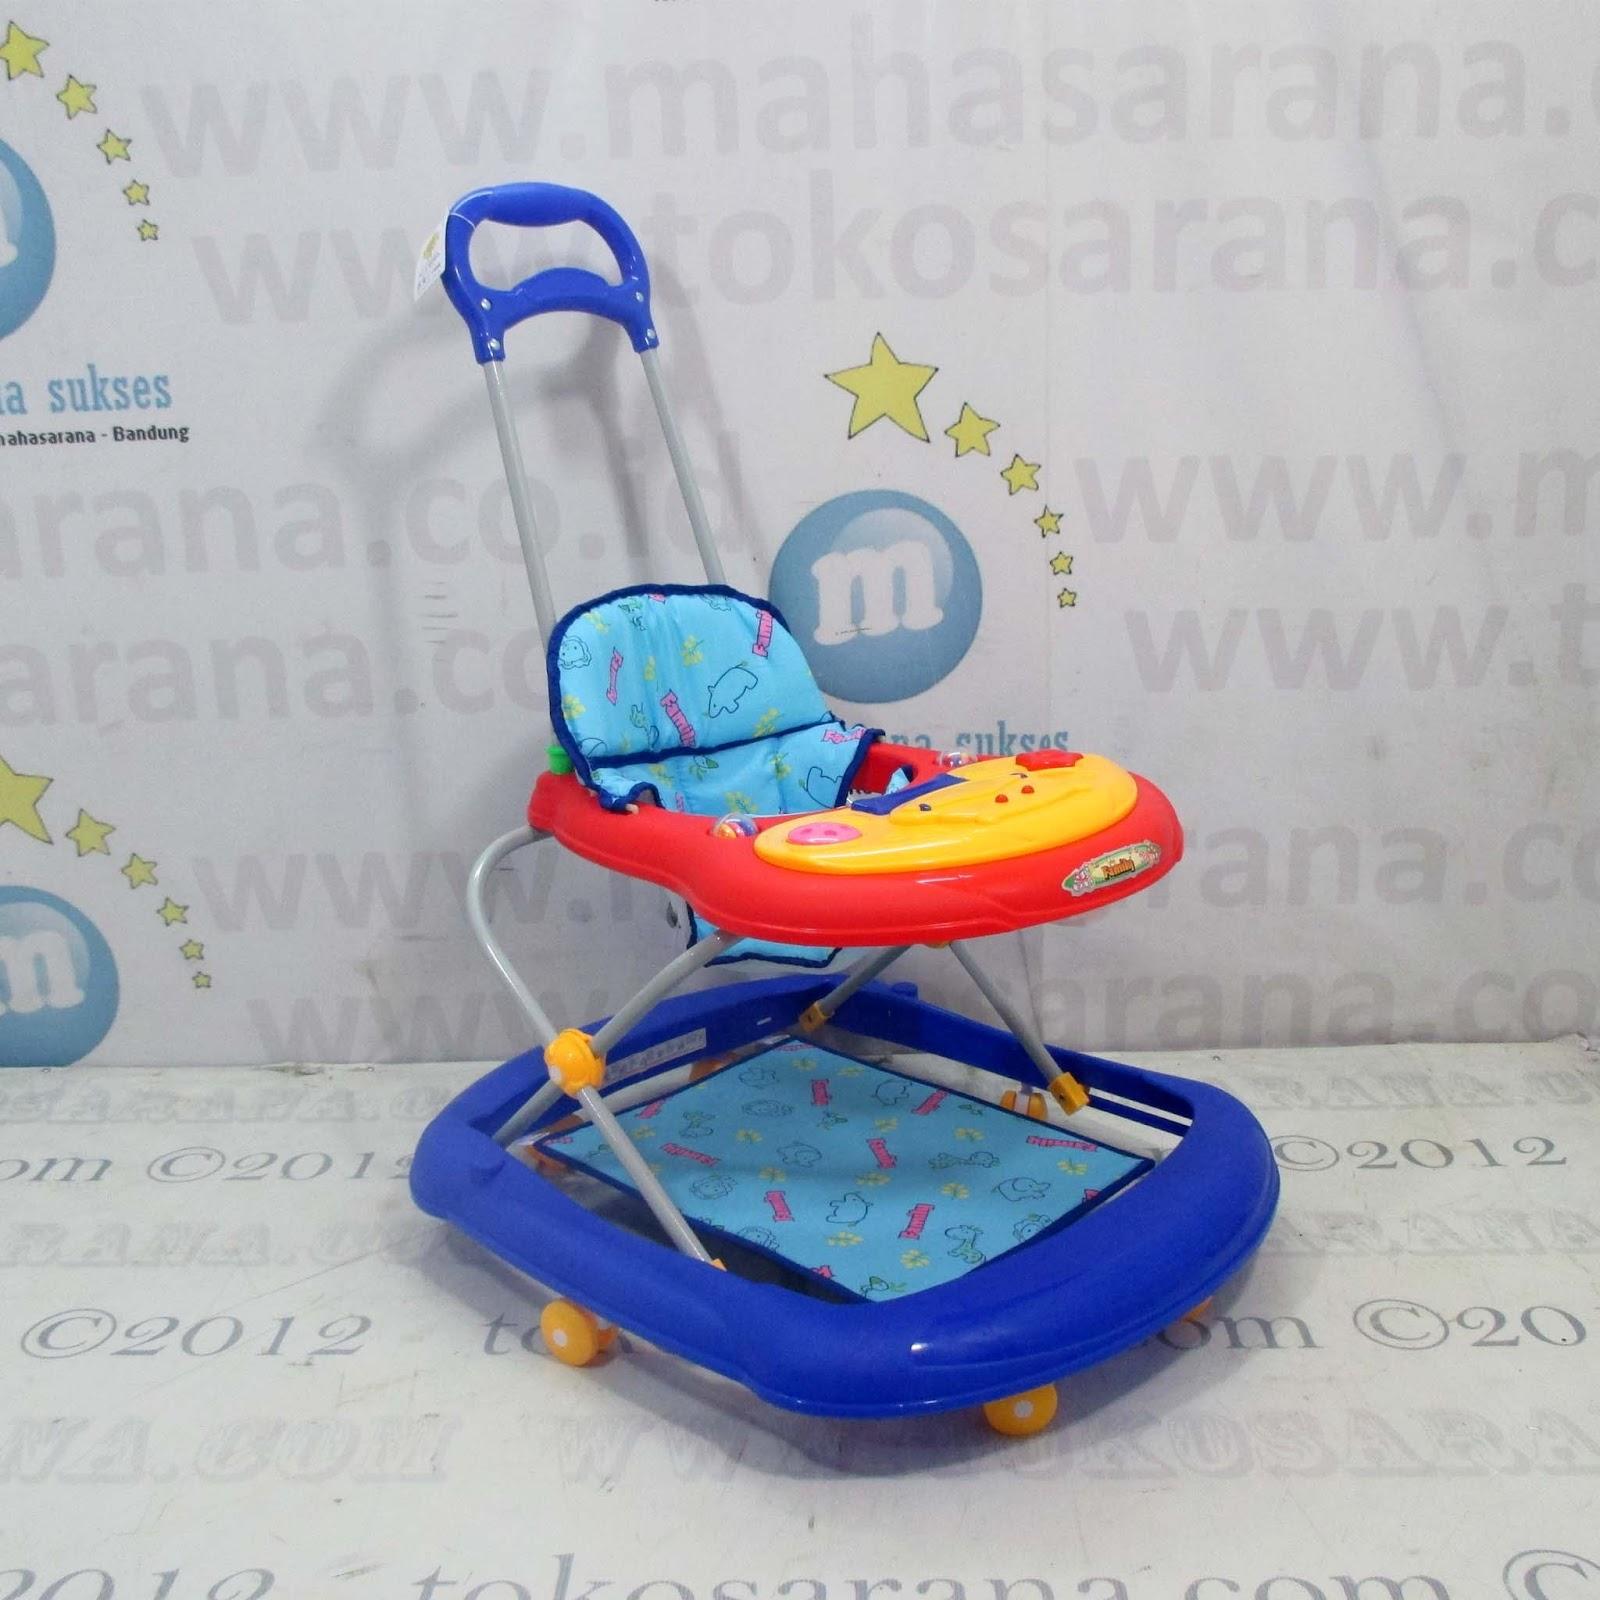 Swing Chair Mudah Reupholster Cushion Diy Tokosaranajakarta Jatinegara Baby Walker Family Fb2211l